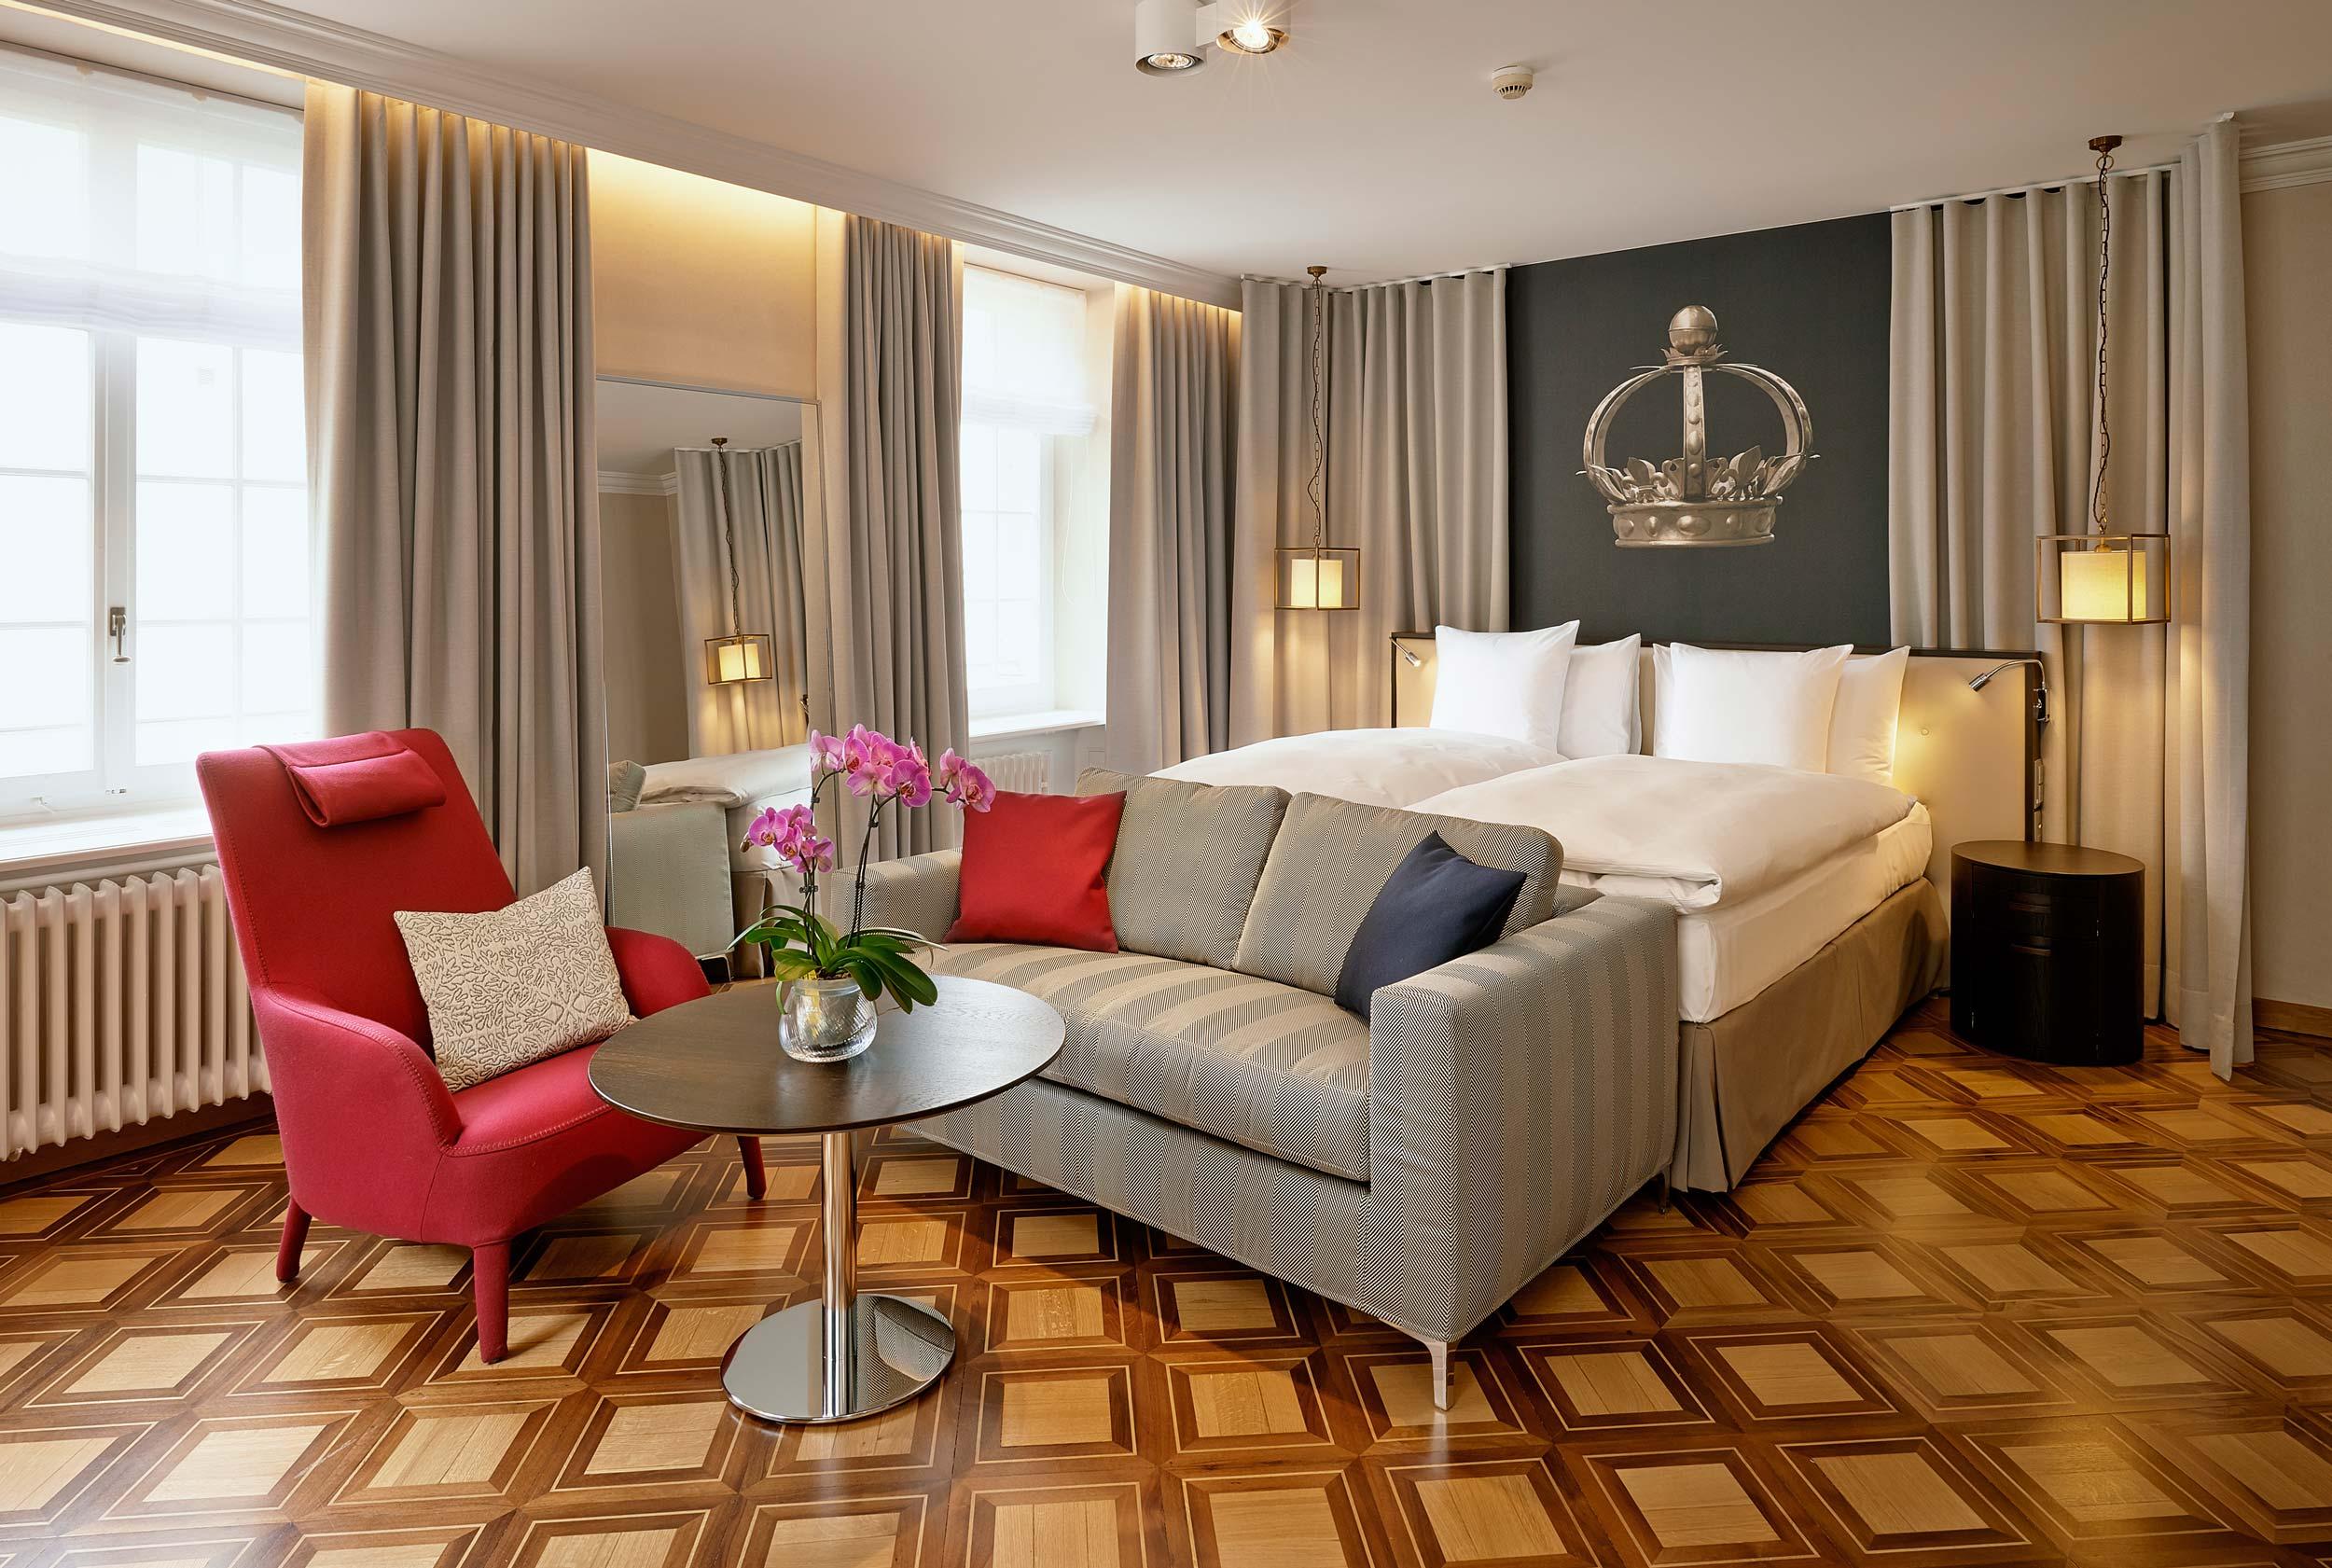 Zfv medien for Sorell hotel krone